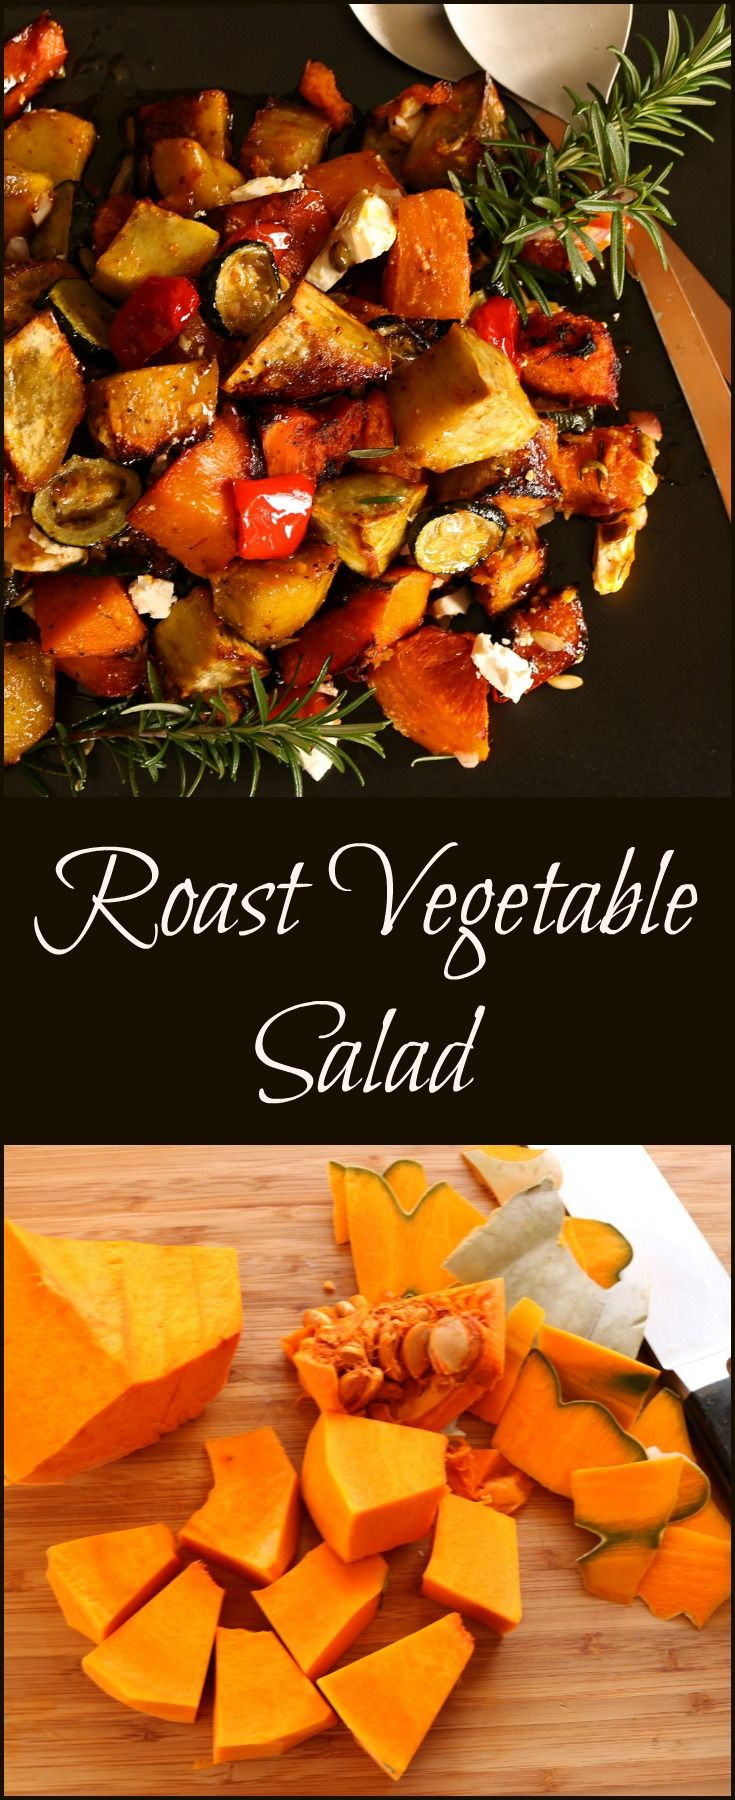 Roast Vegetable Salad with Maple Dressing